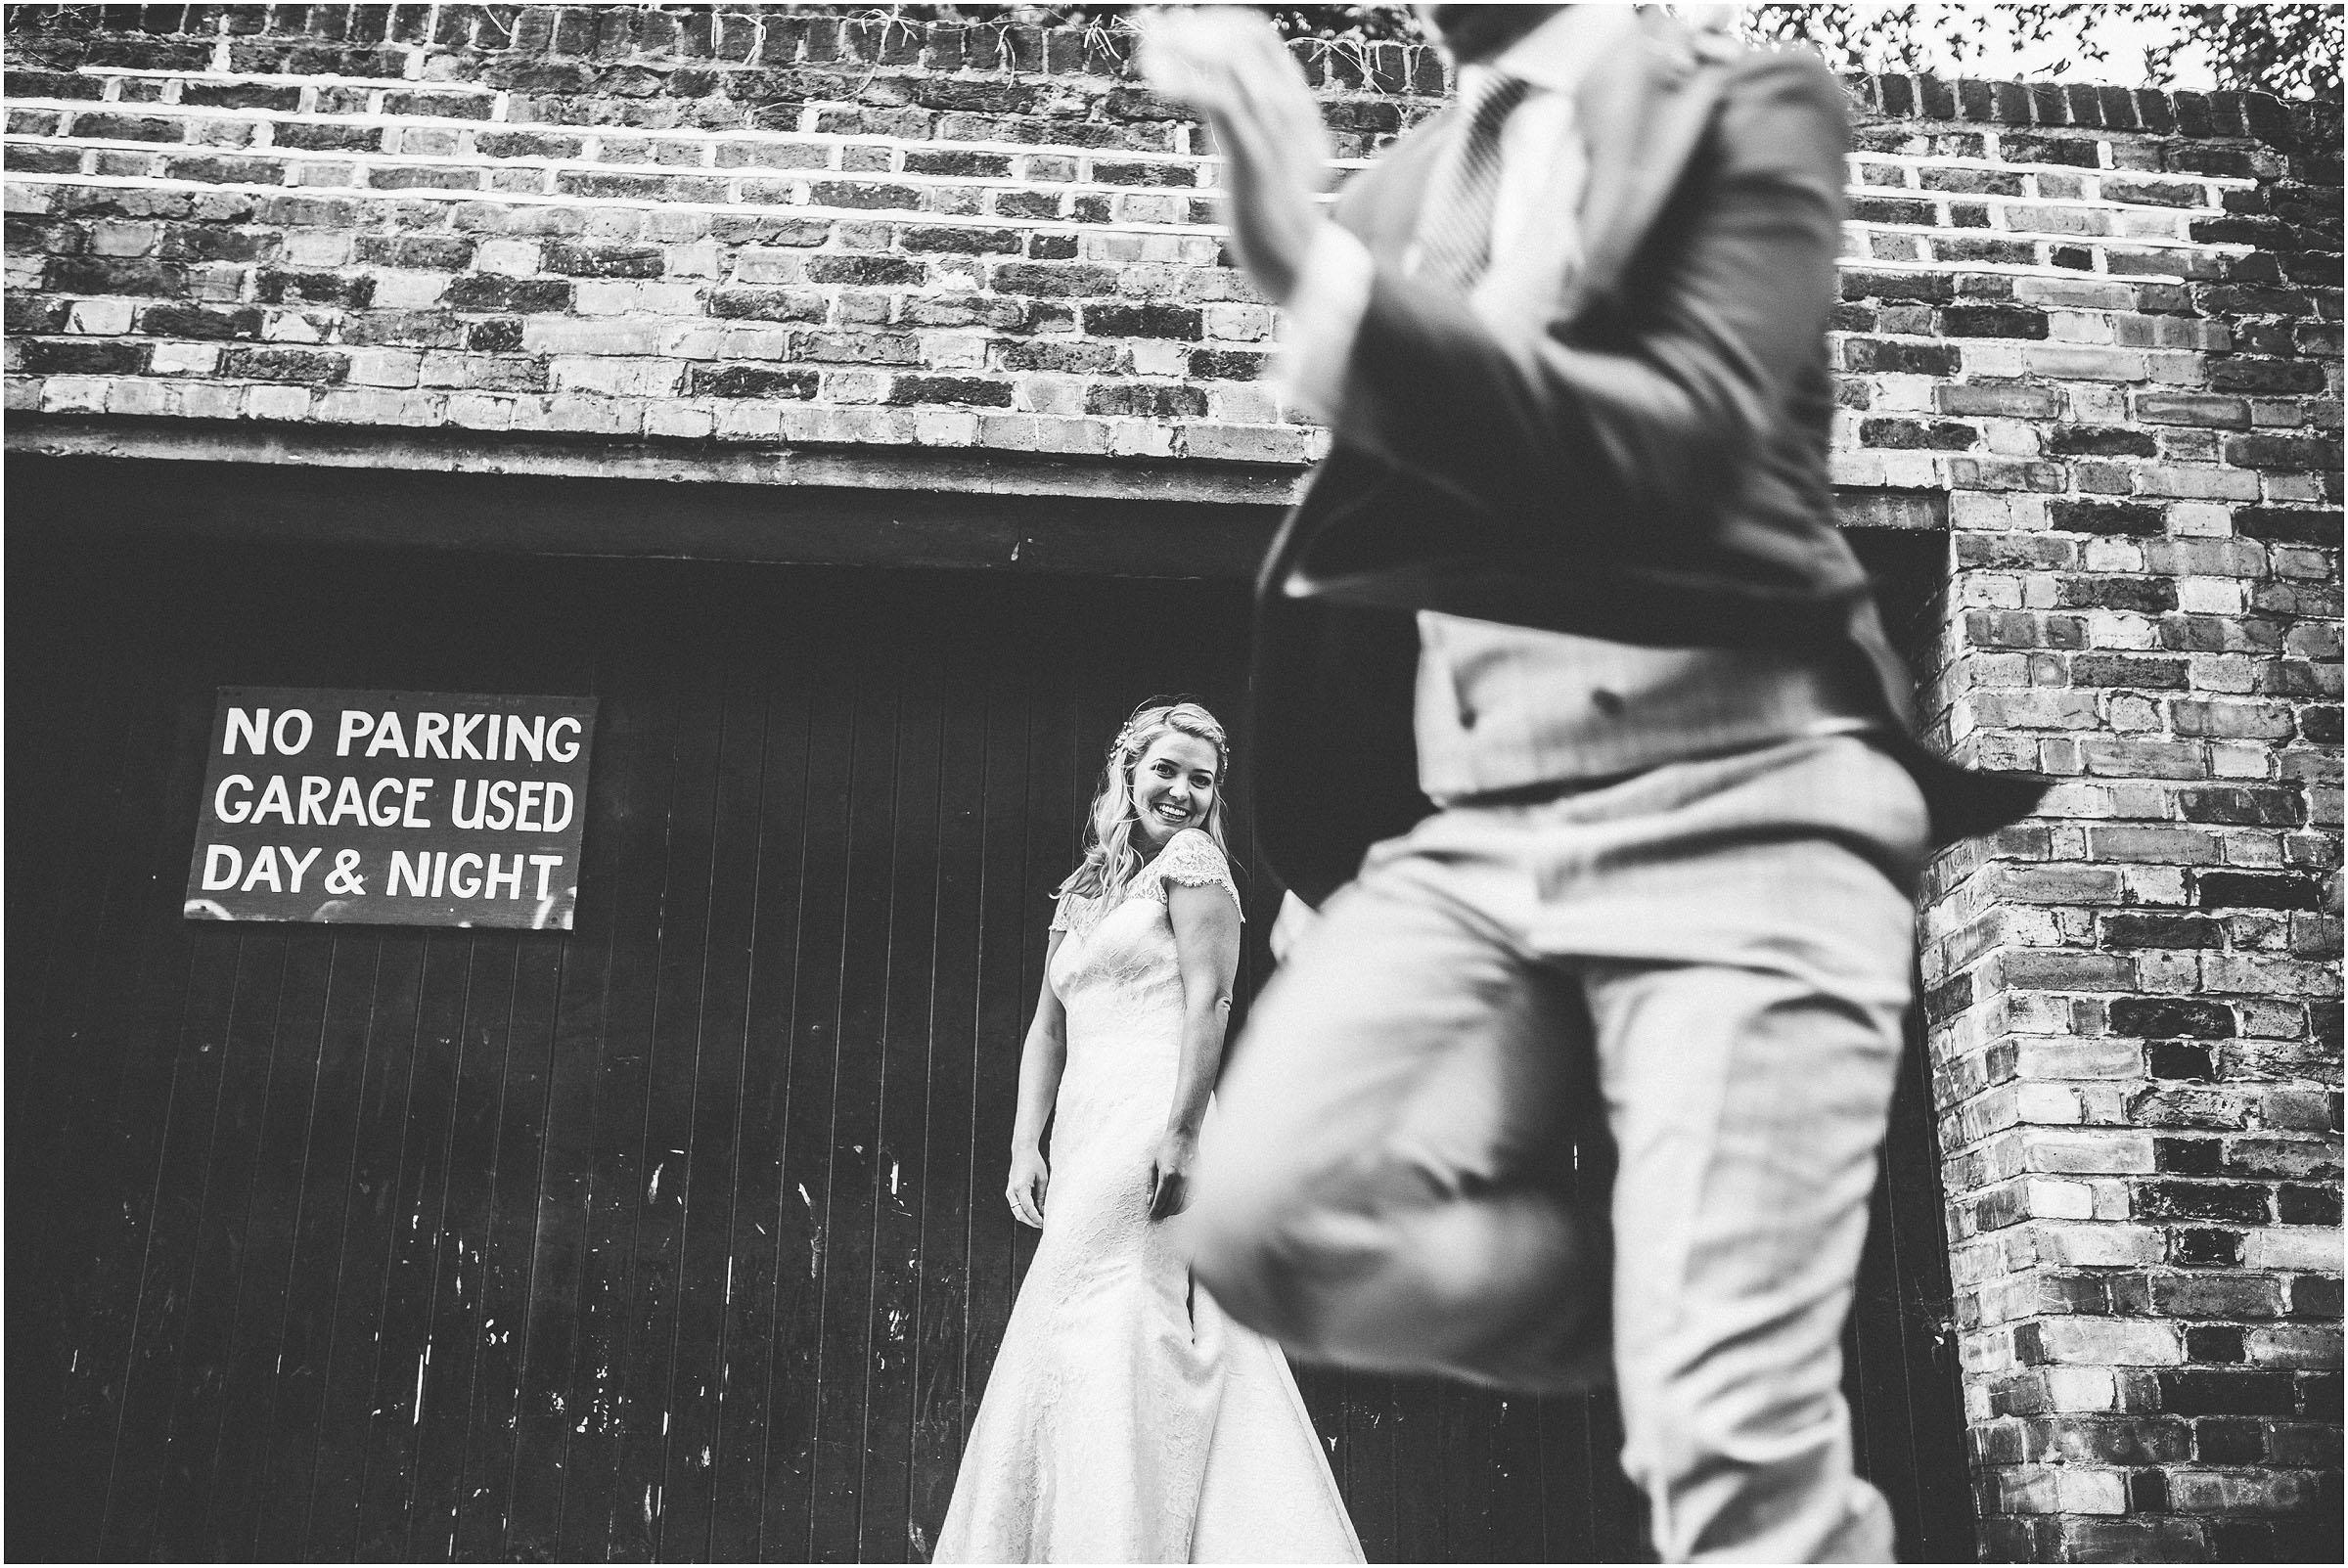 Kensington_Roof_Gardens_Wedding_Photography_0064